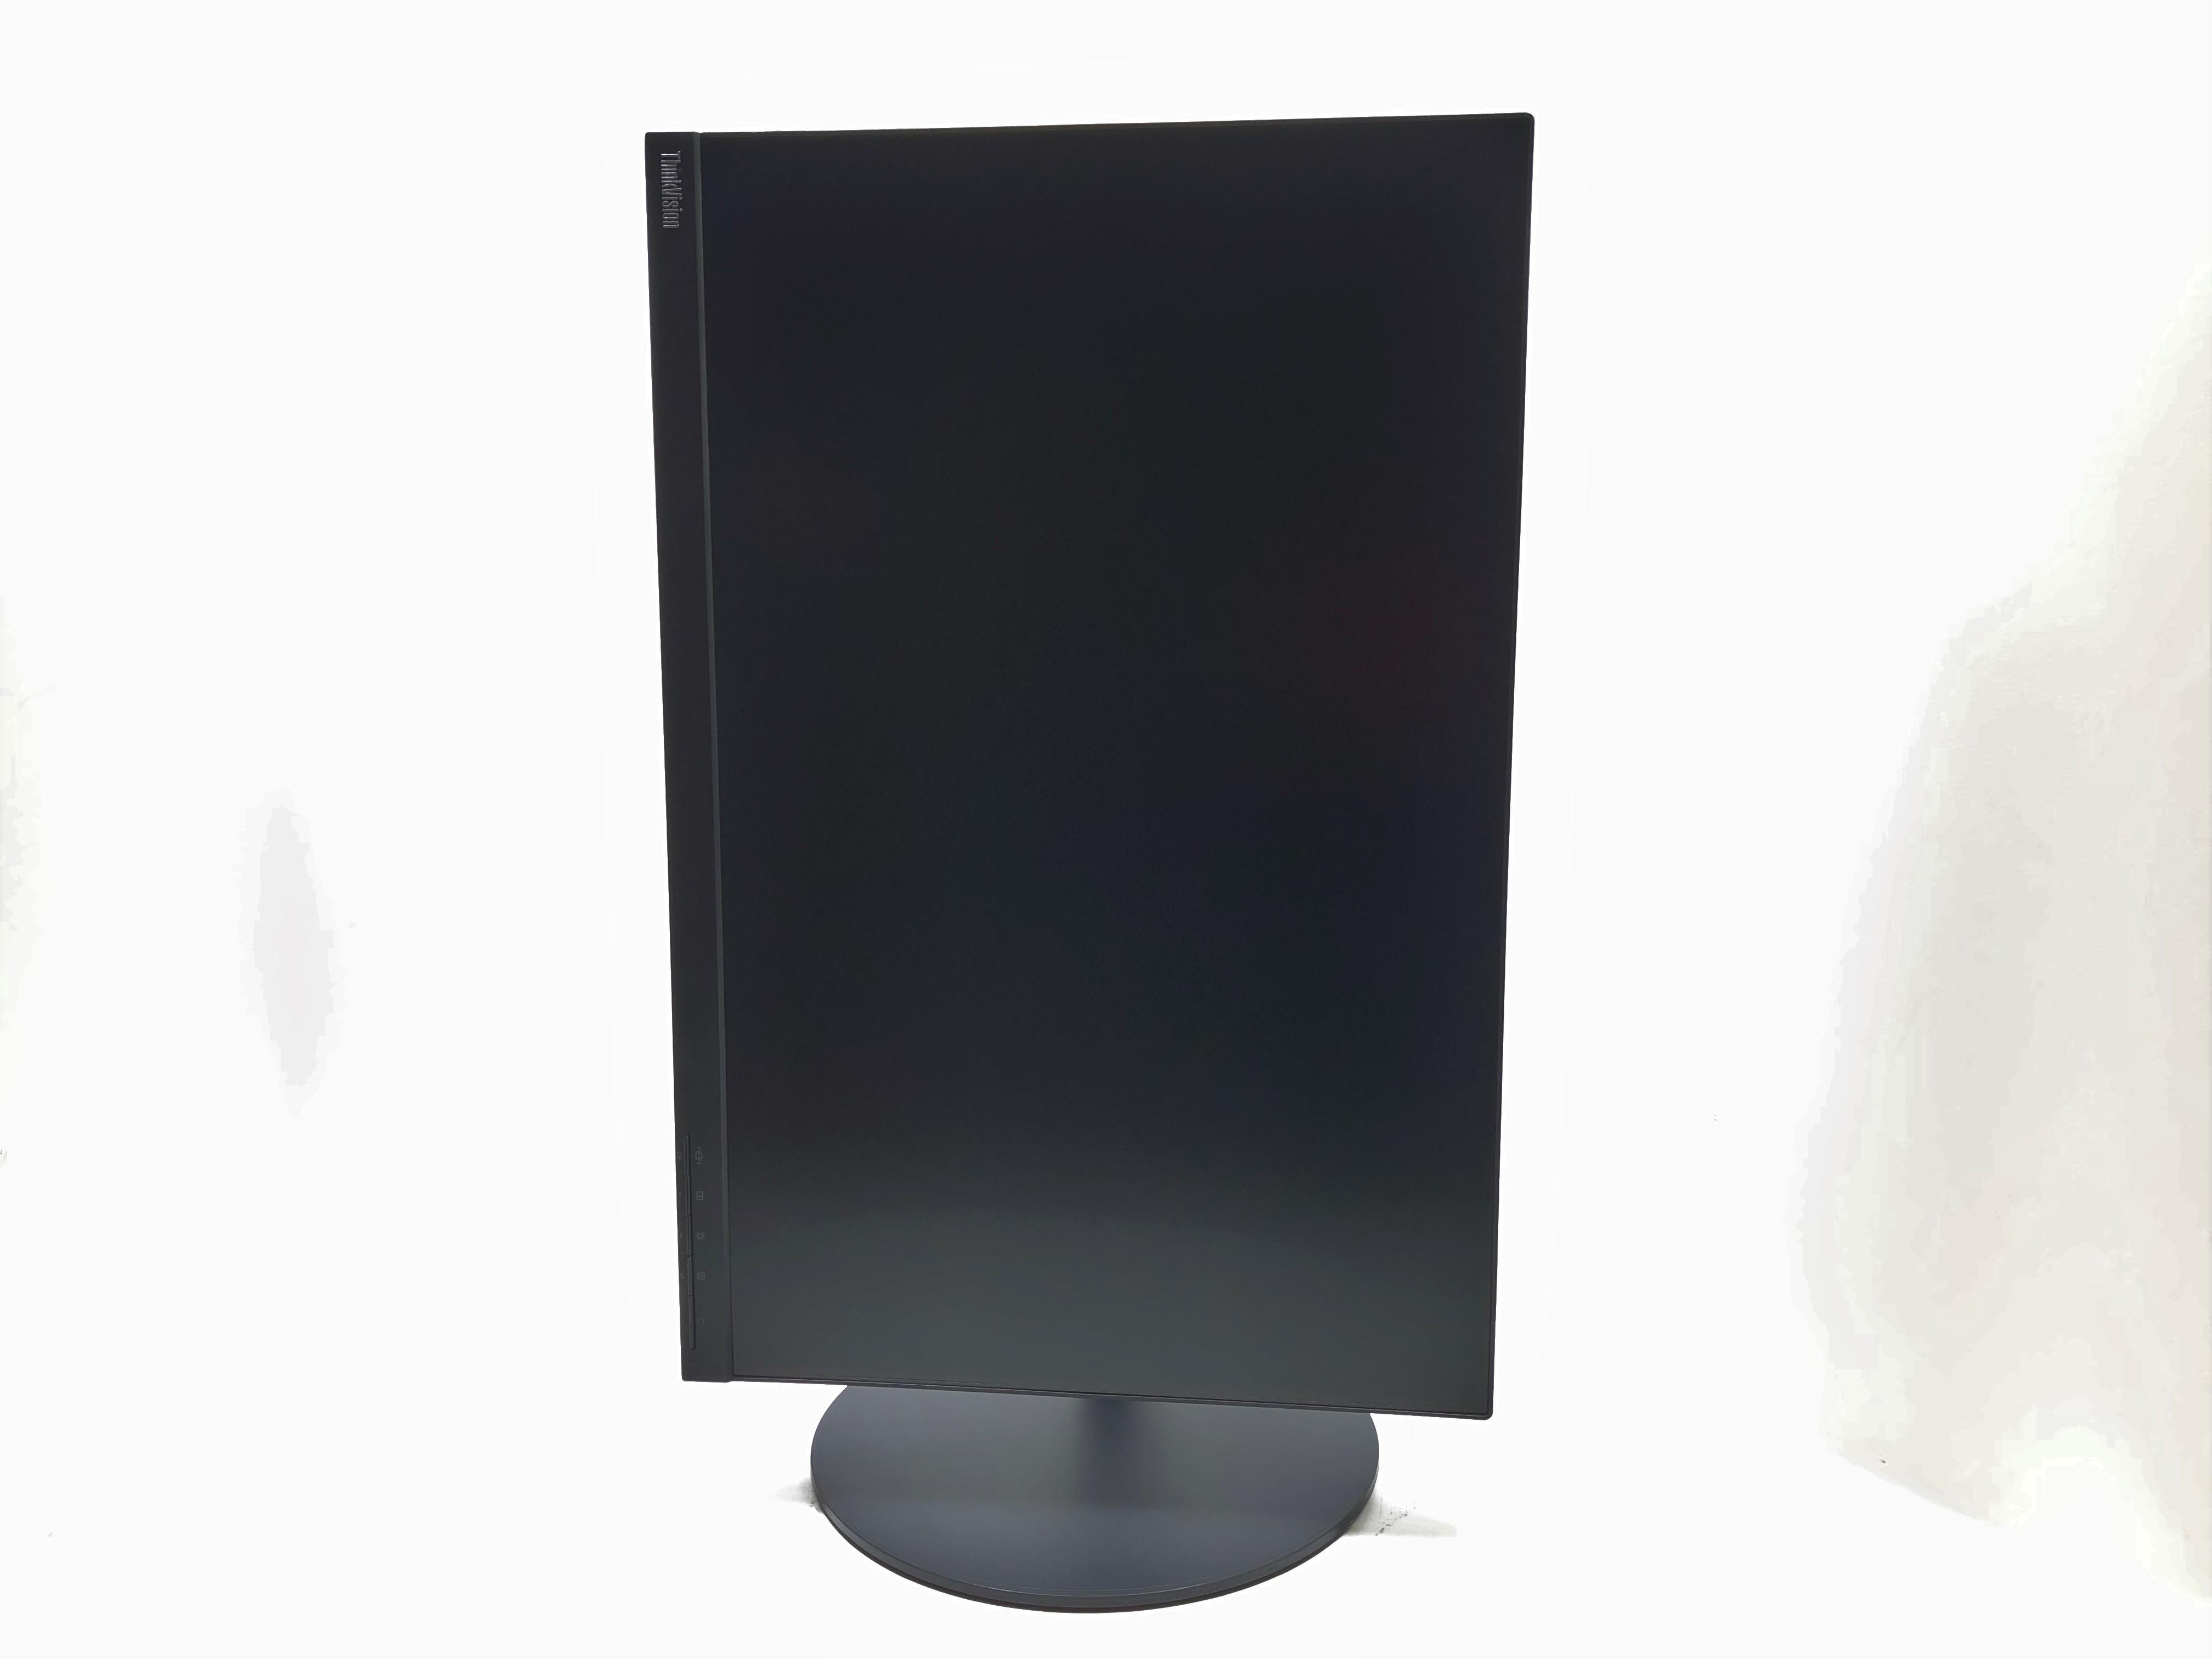 Lenovo ThinkVision T24d-10 No 2